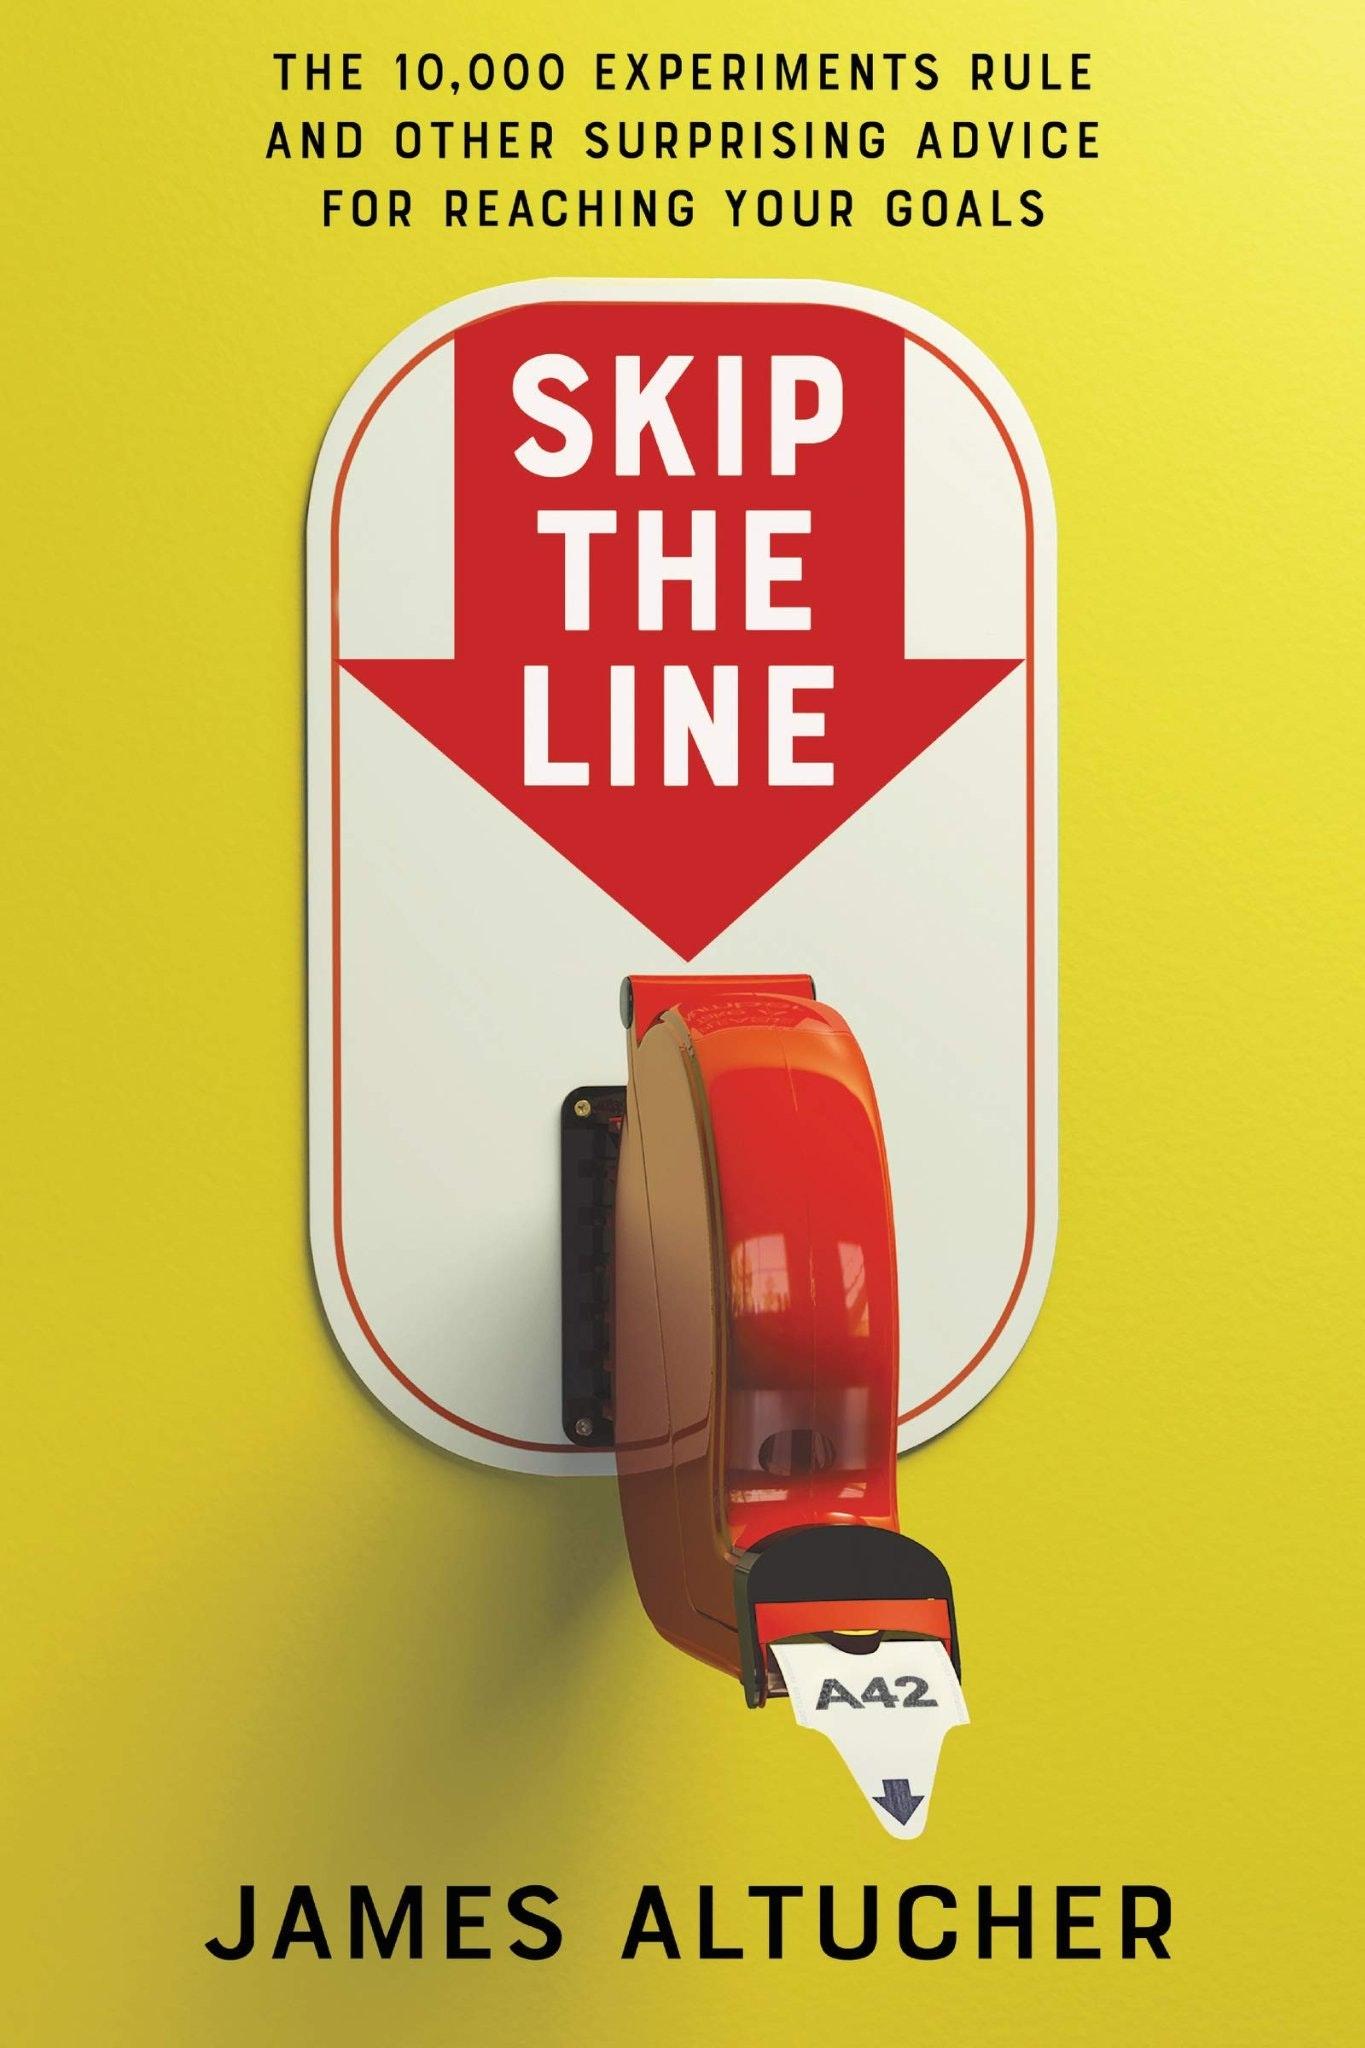 Skip the Line by James Altucher